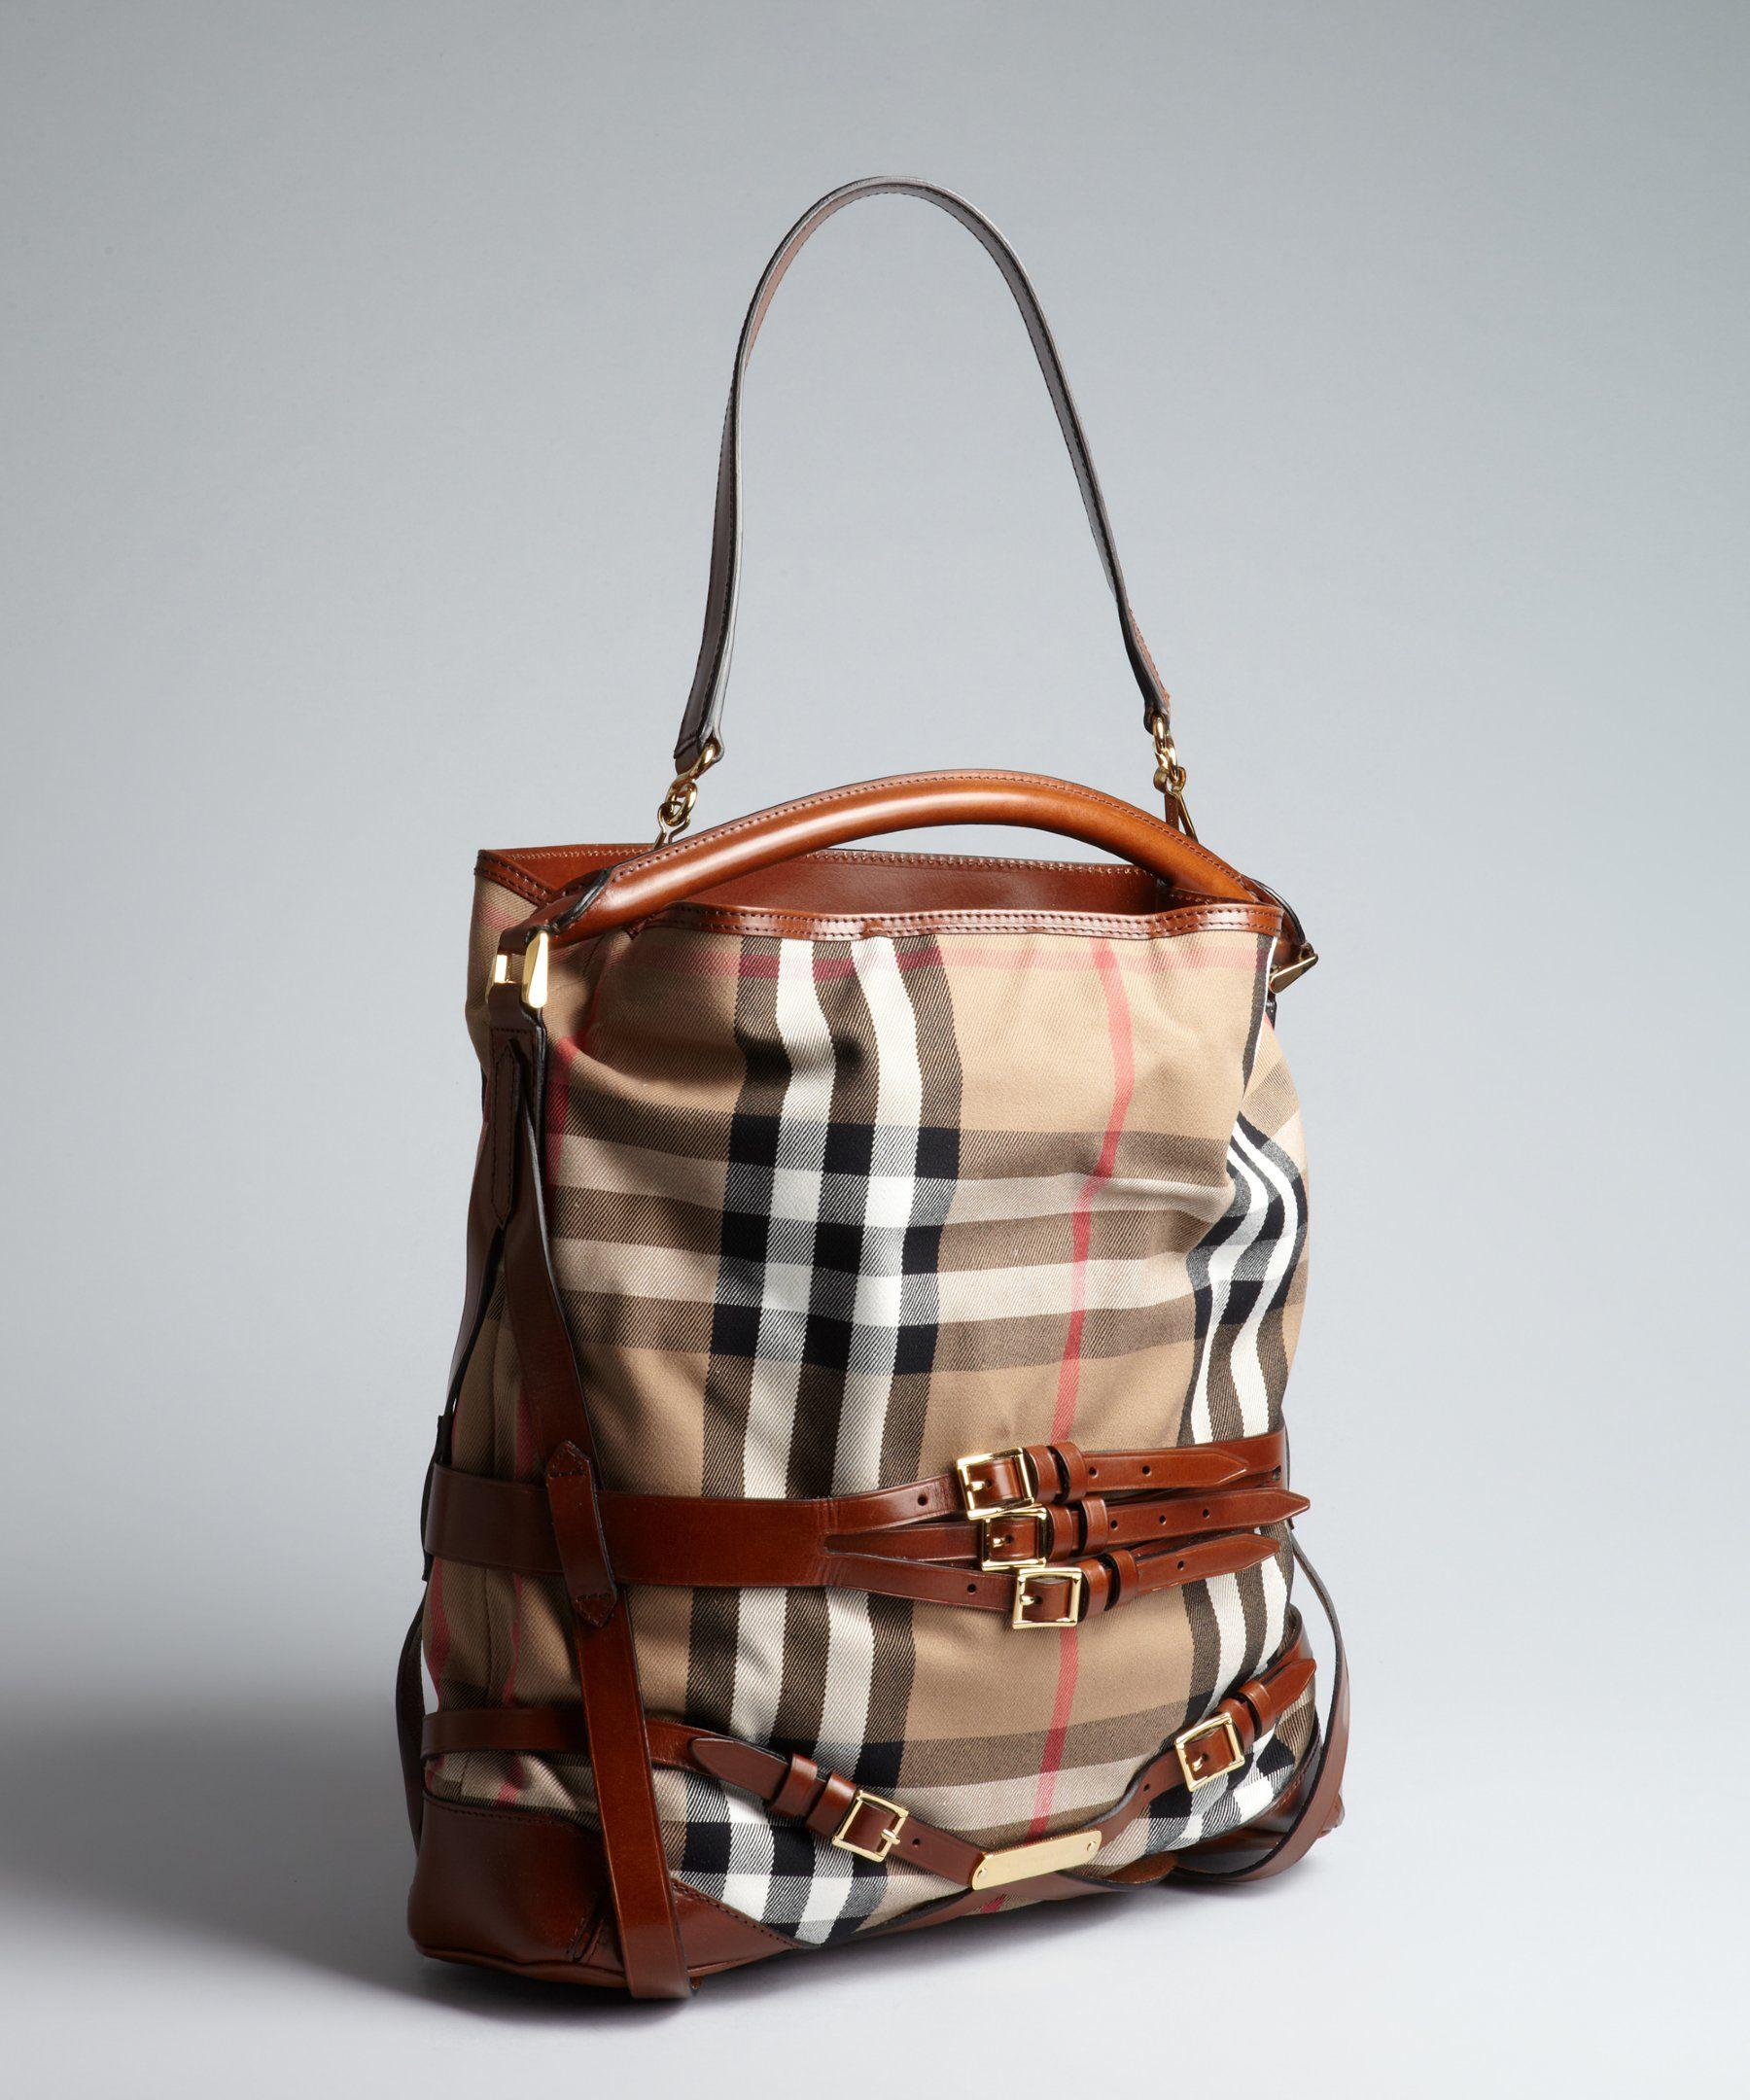 Prefect fall bag   Love that Purse Bag   Pinterest   Burberry, Bags ... f560163ebd